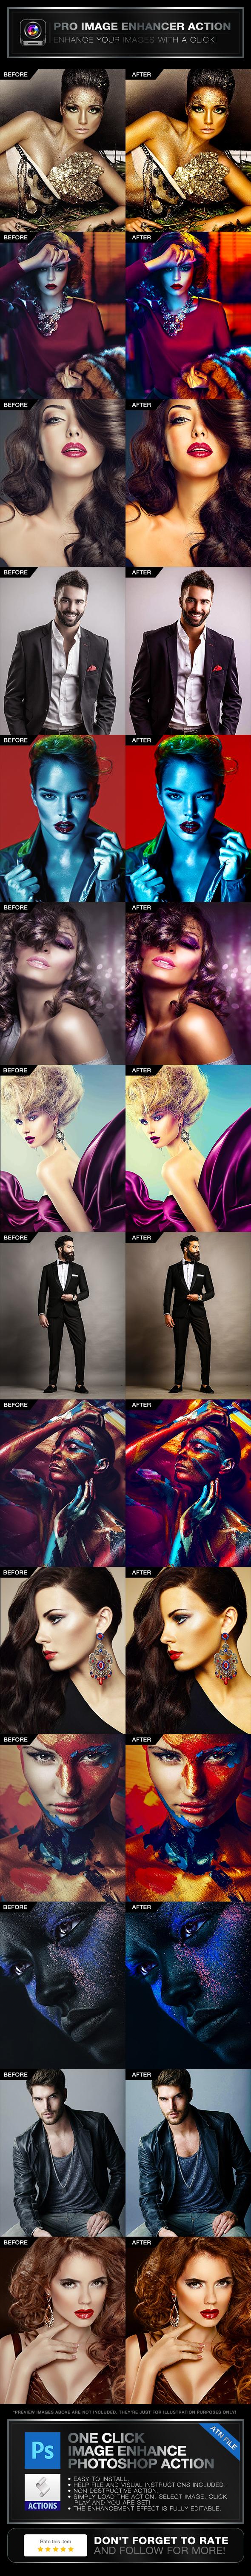 Pro Image Enhancer Photoshop Action - Photo Effects Actions